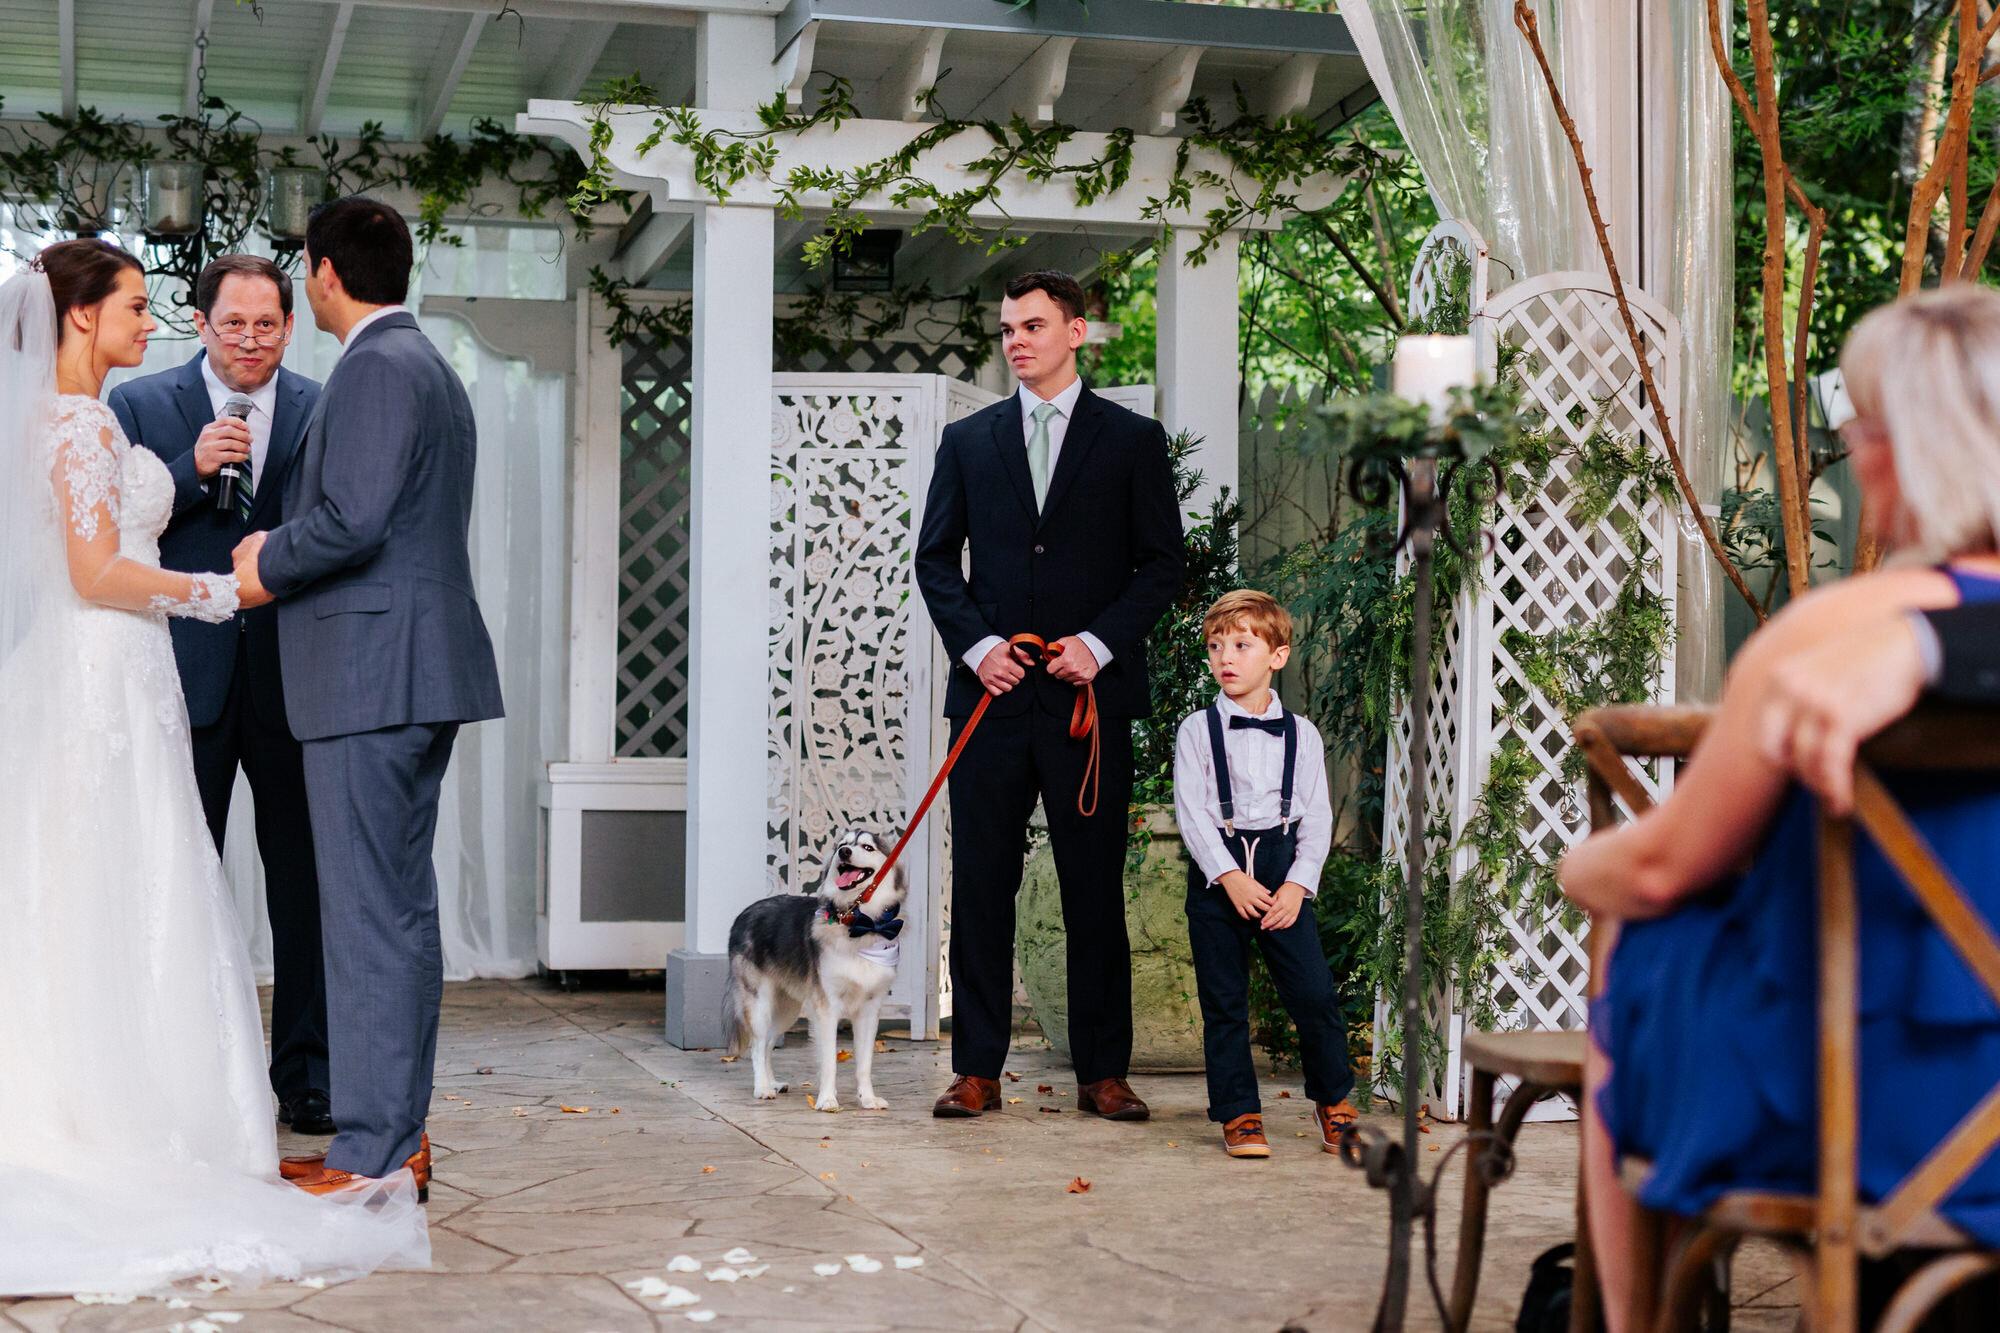 twigs-tempietto-wedding-greenville-downtown-349.JPG